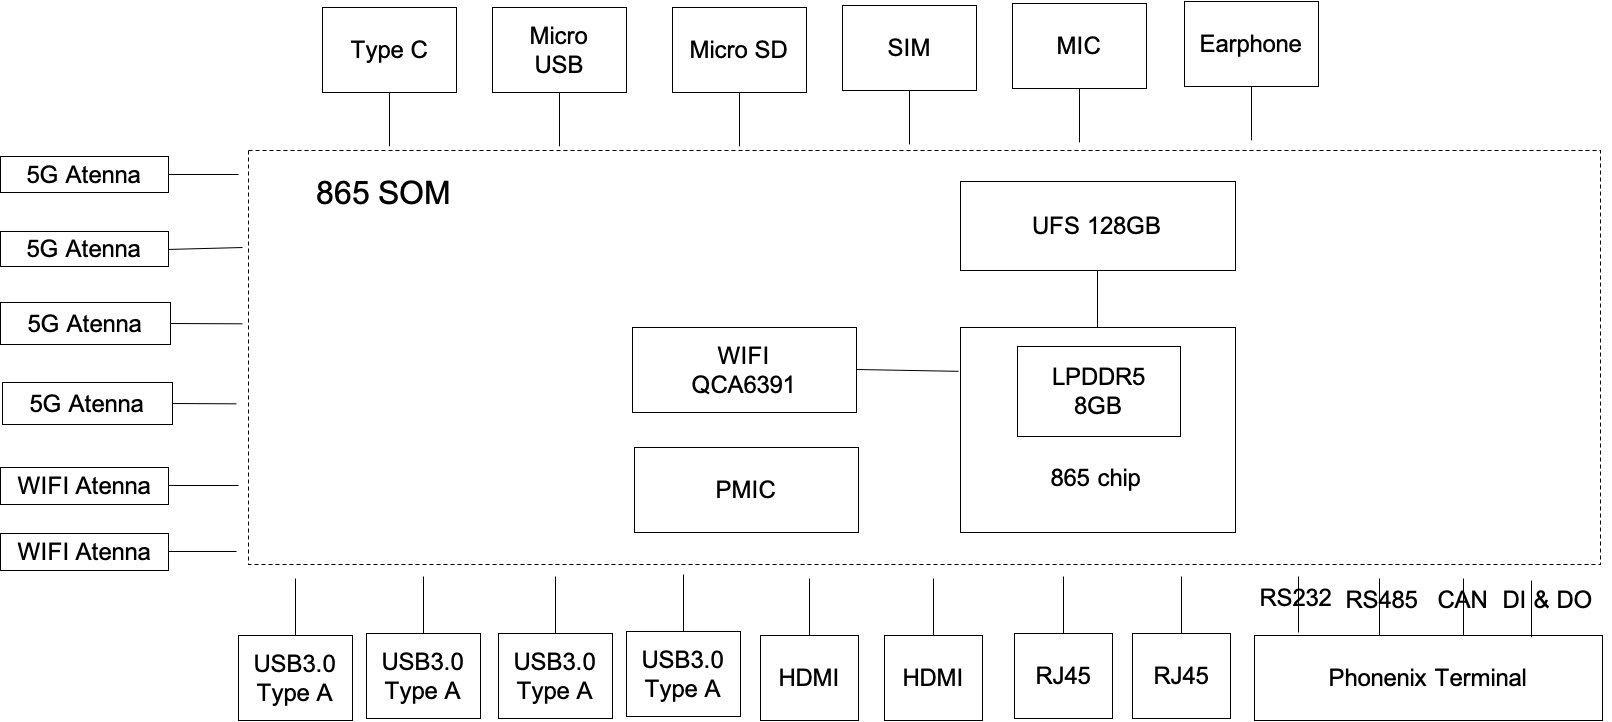 EB5 system architecture